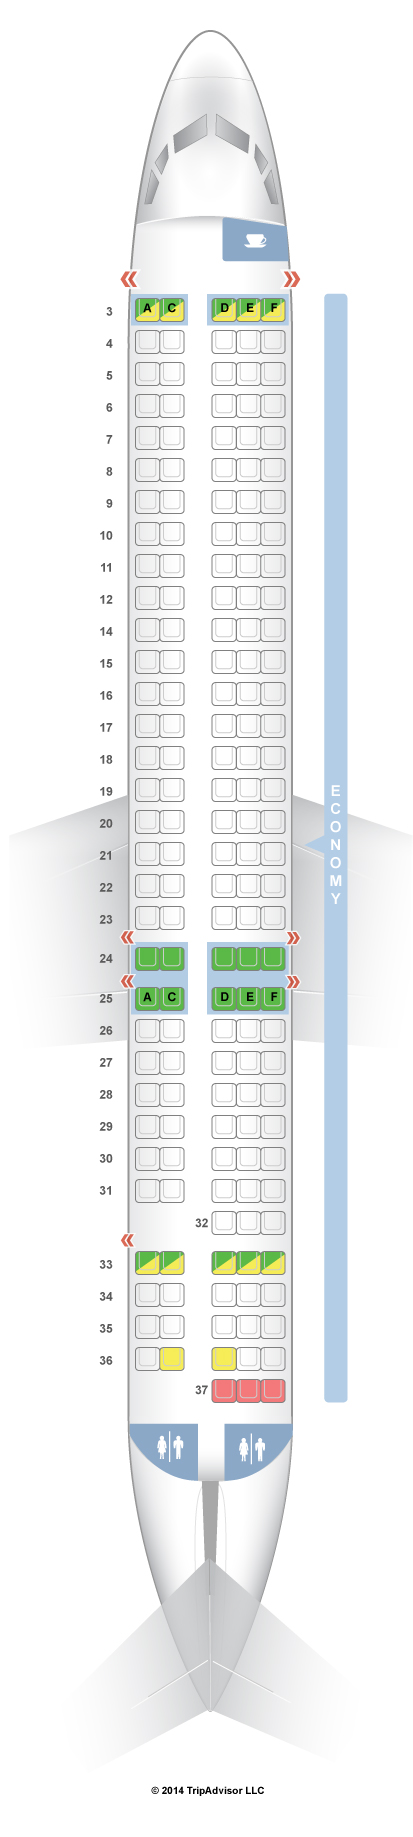 seatguru seat map allegiant mcdonnell douglas md 80 m80